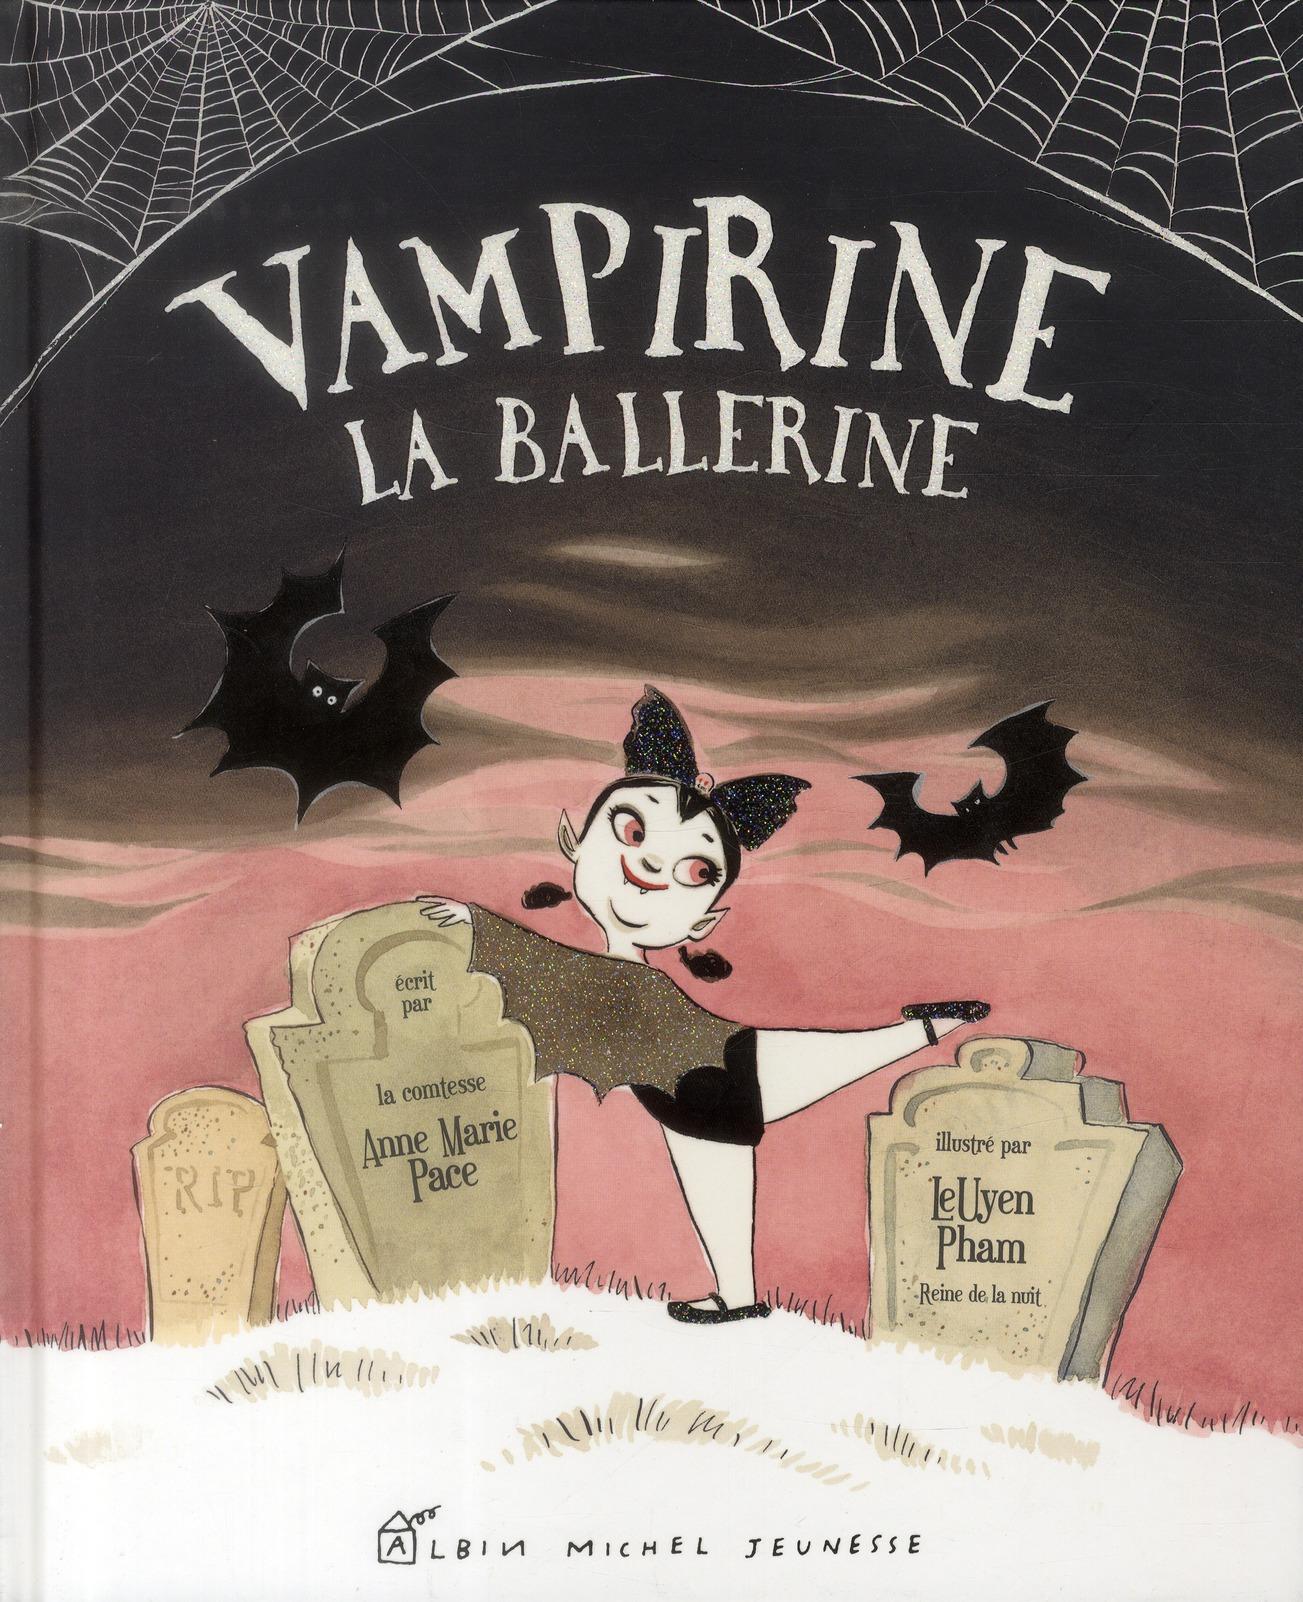 VAMPIRINE LA BALLERINE